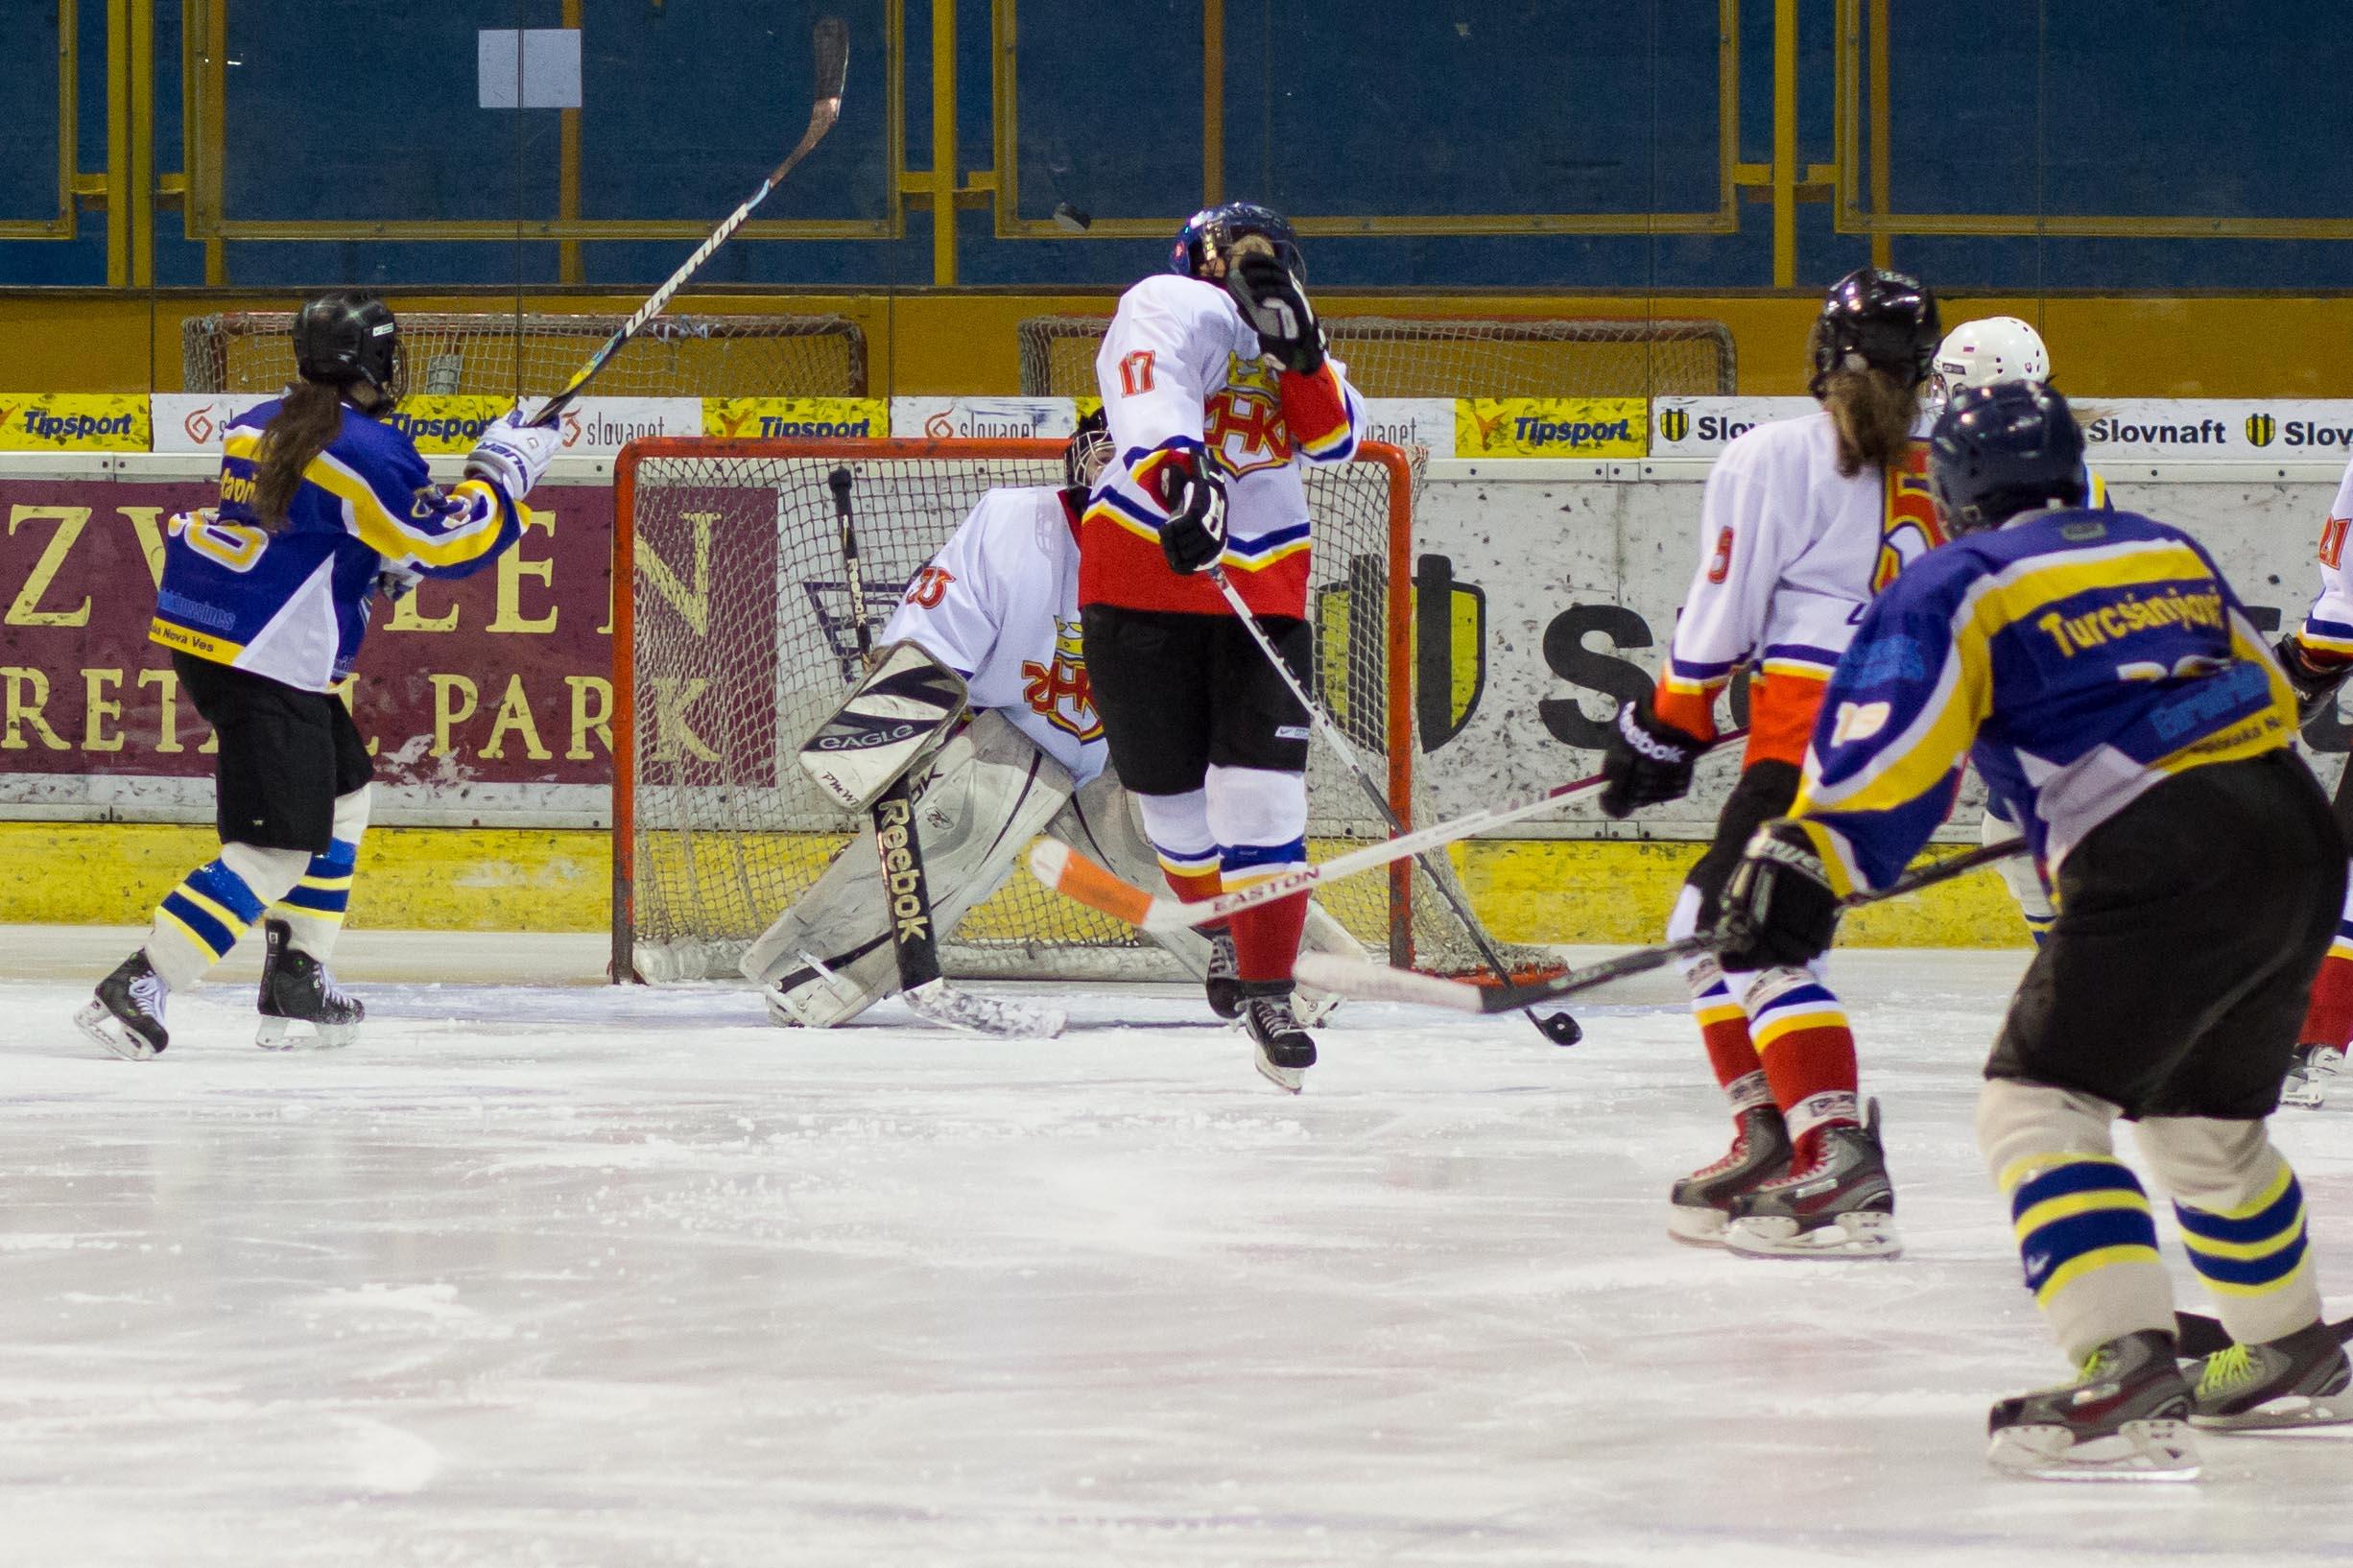 zhkm-zvolen-hc-spisska-n-ves-2013-hokej-3